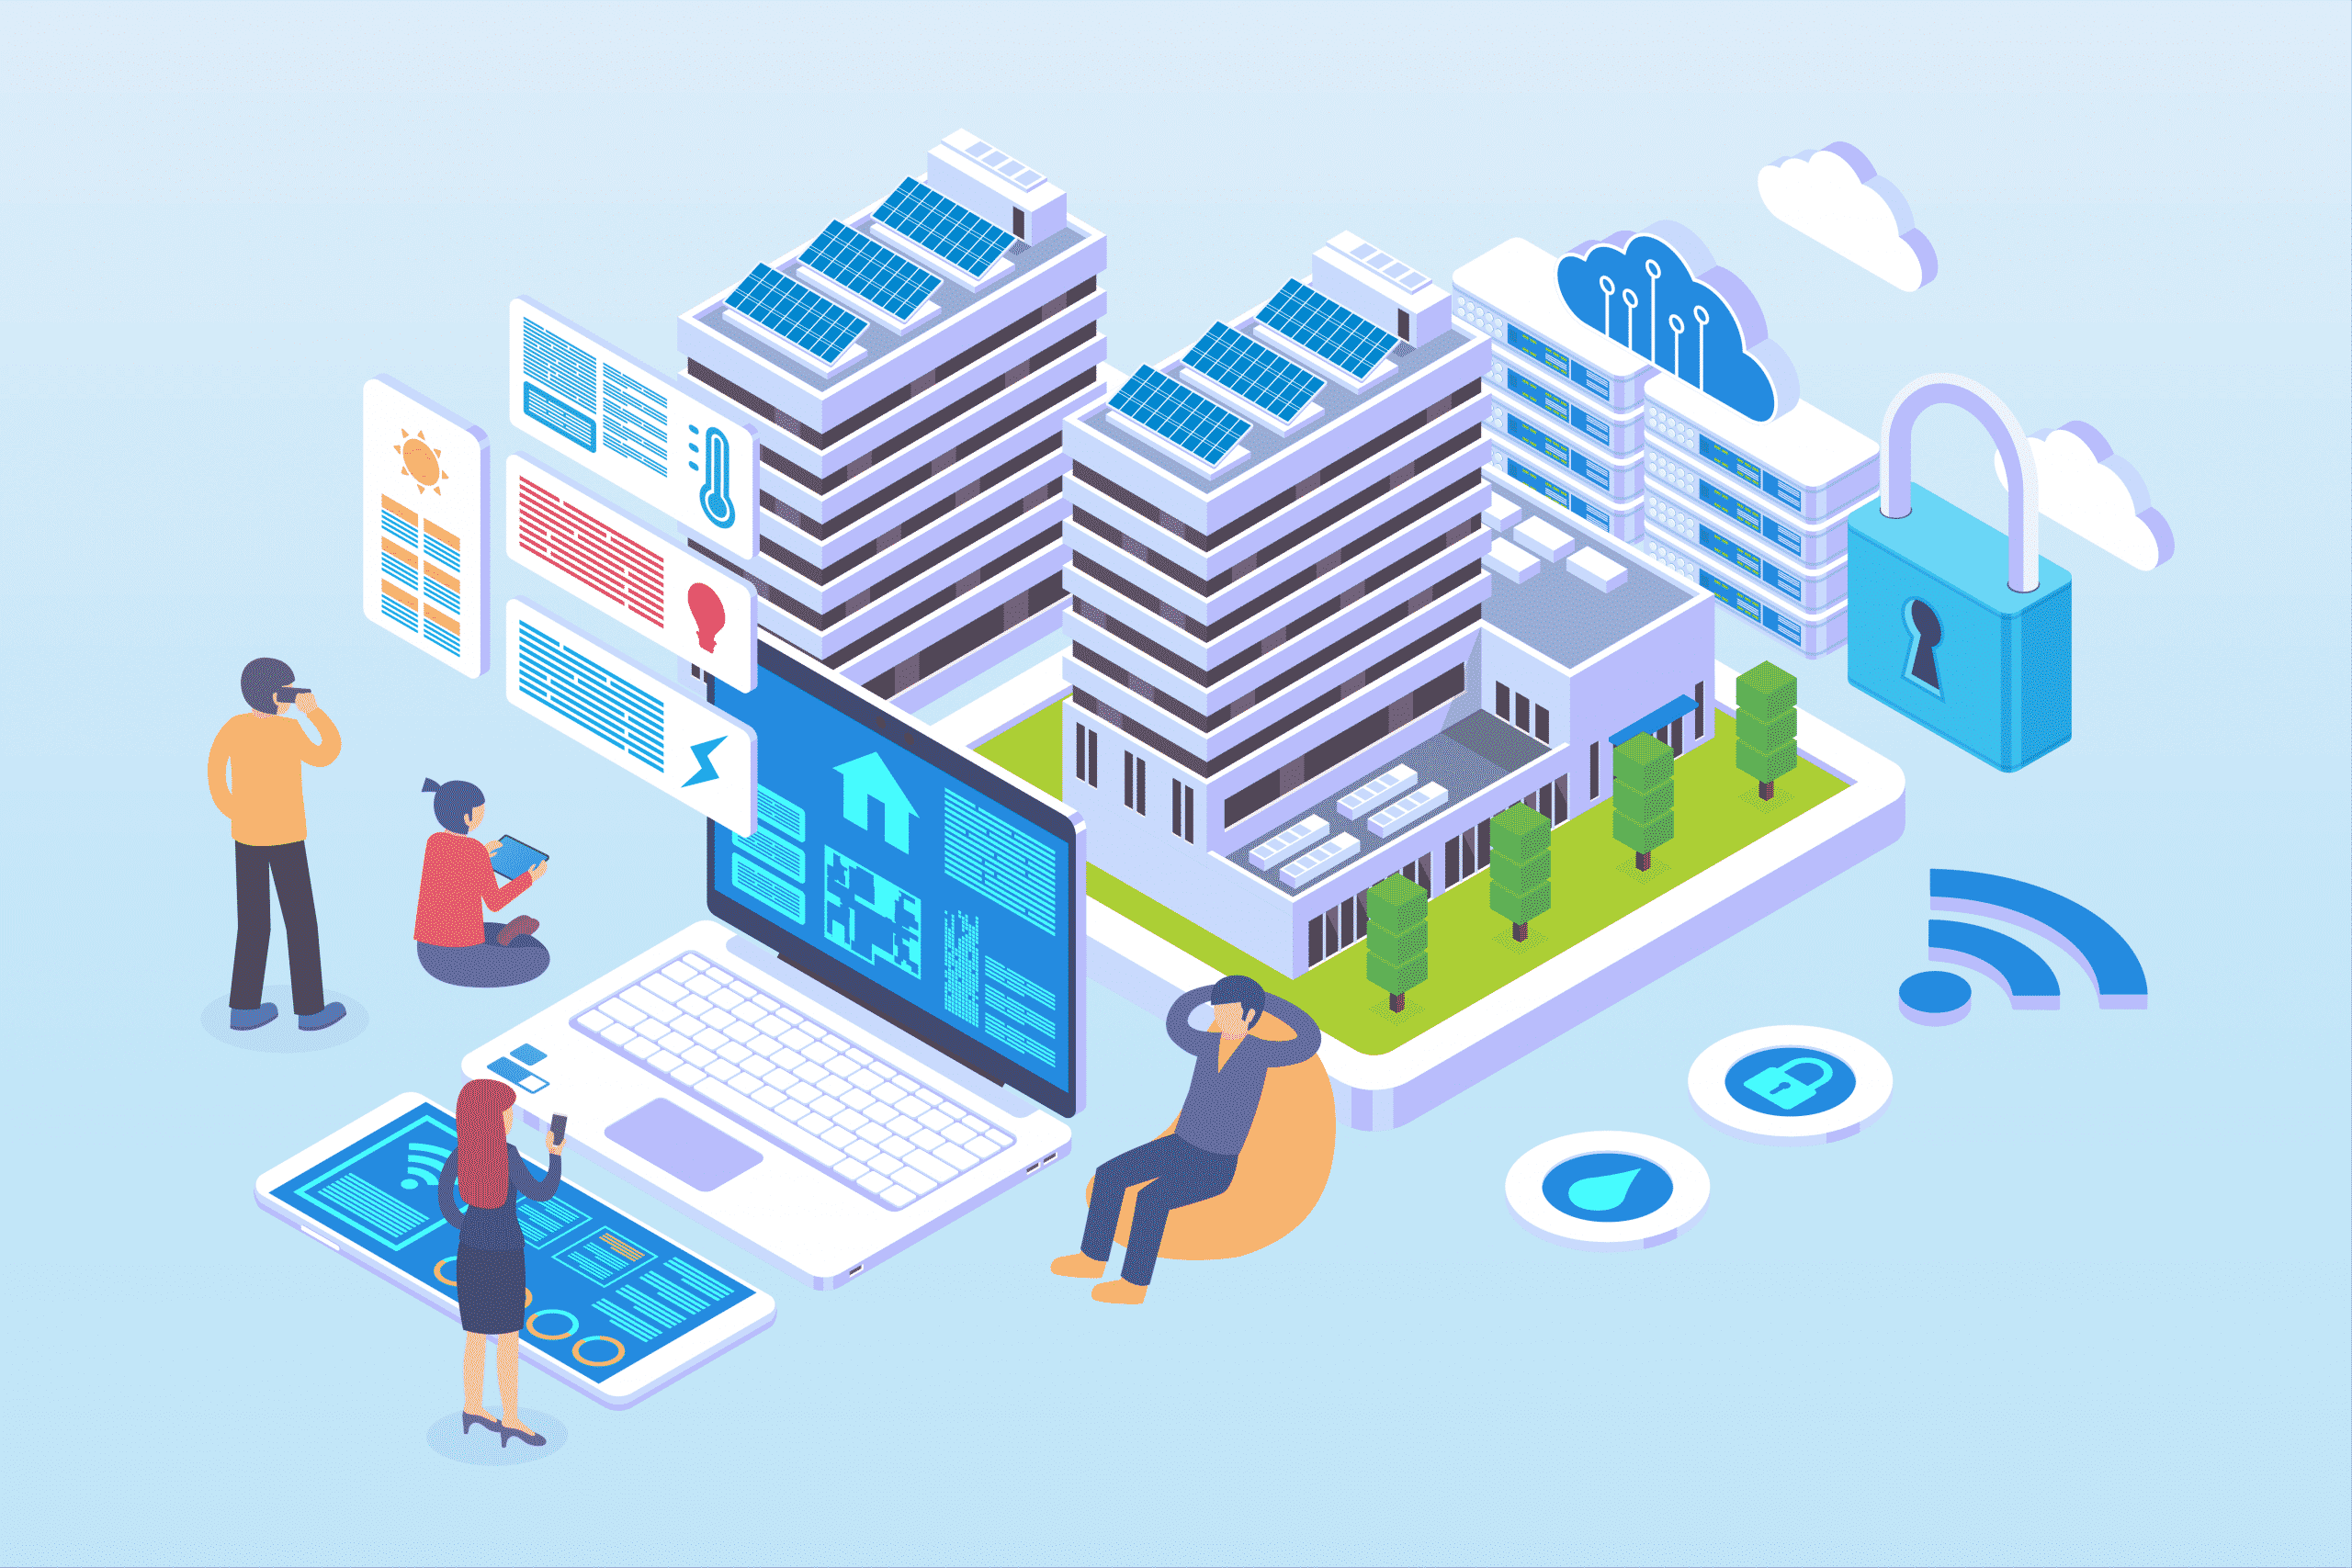 Top 100 PropTech startups 2020